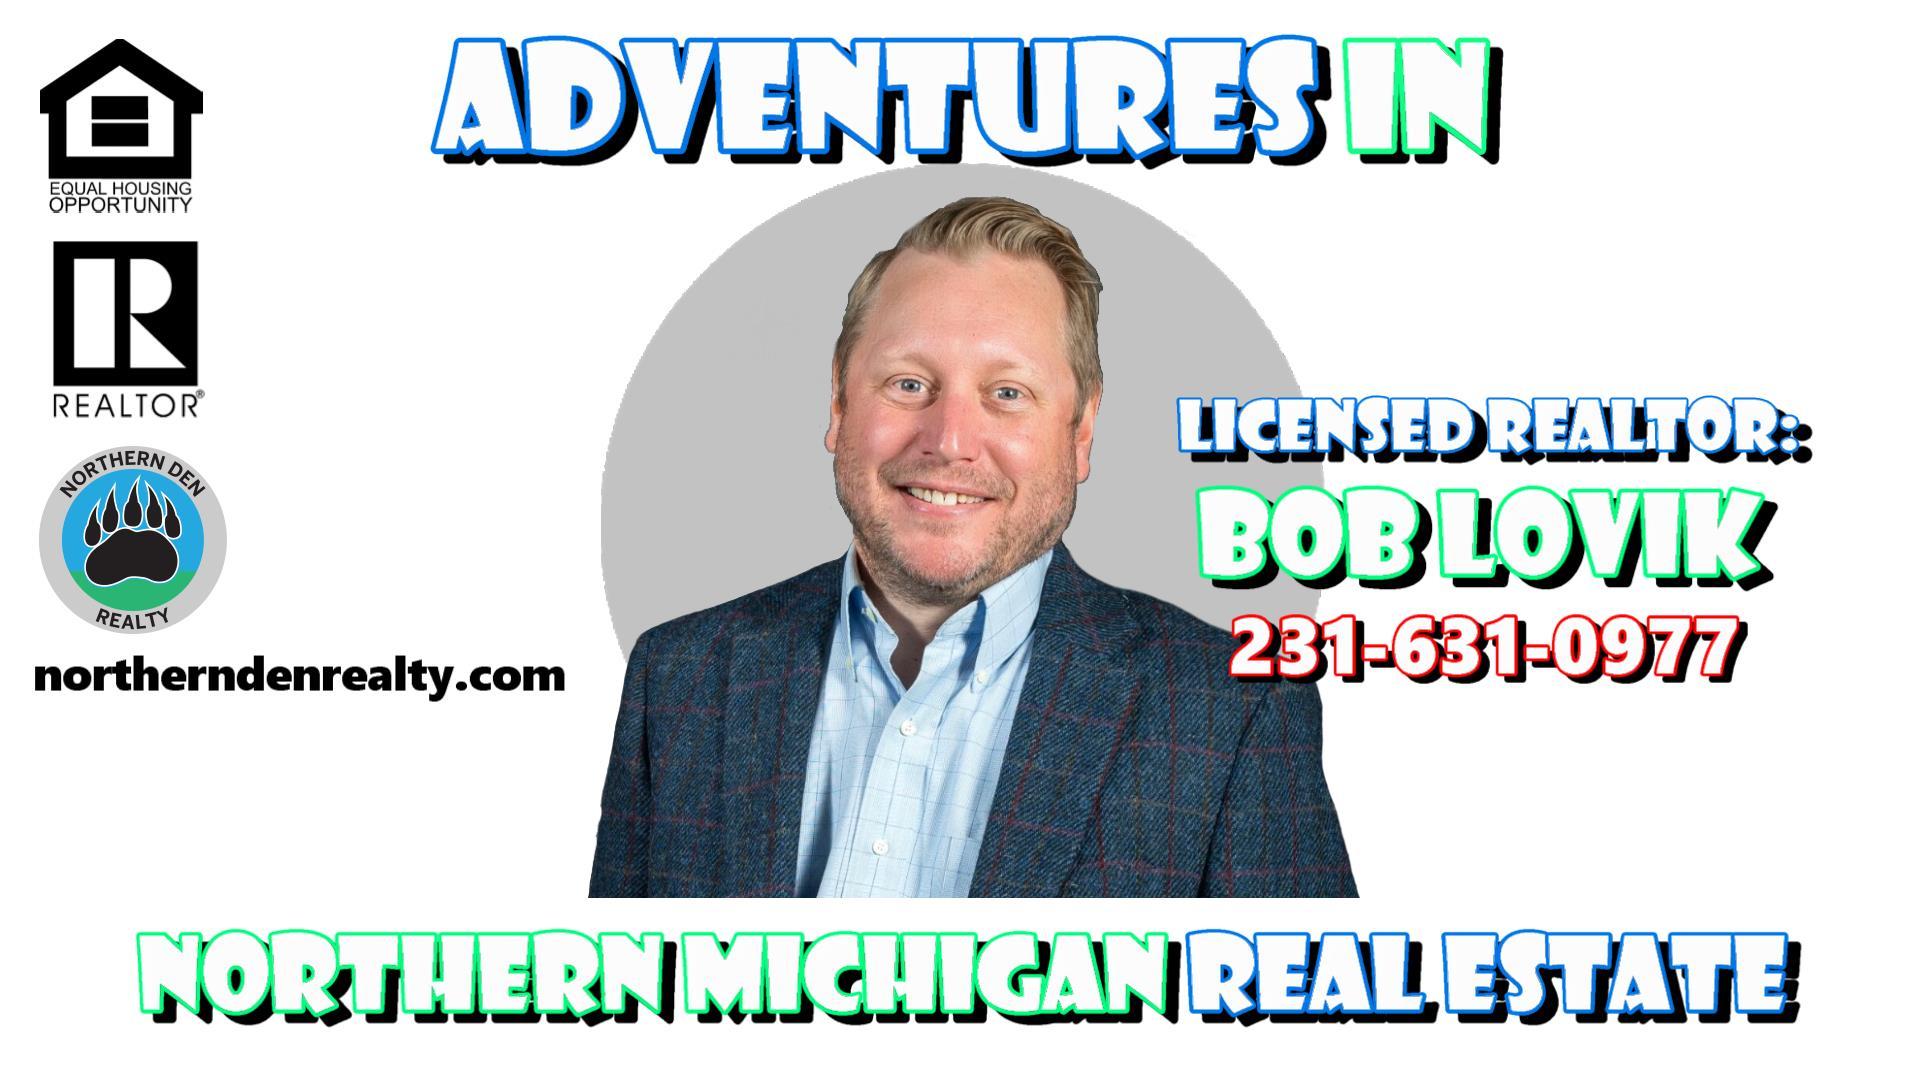 Adventures In Northern Michigan Real Estate! – New Series From Realtor Bob Lovik